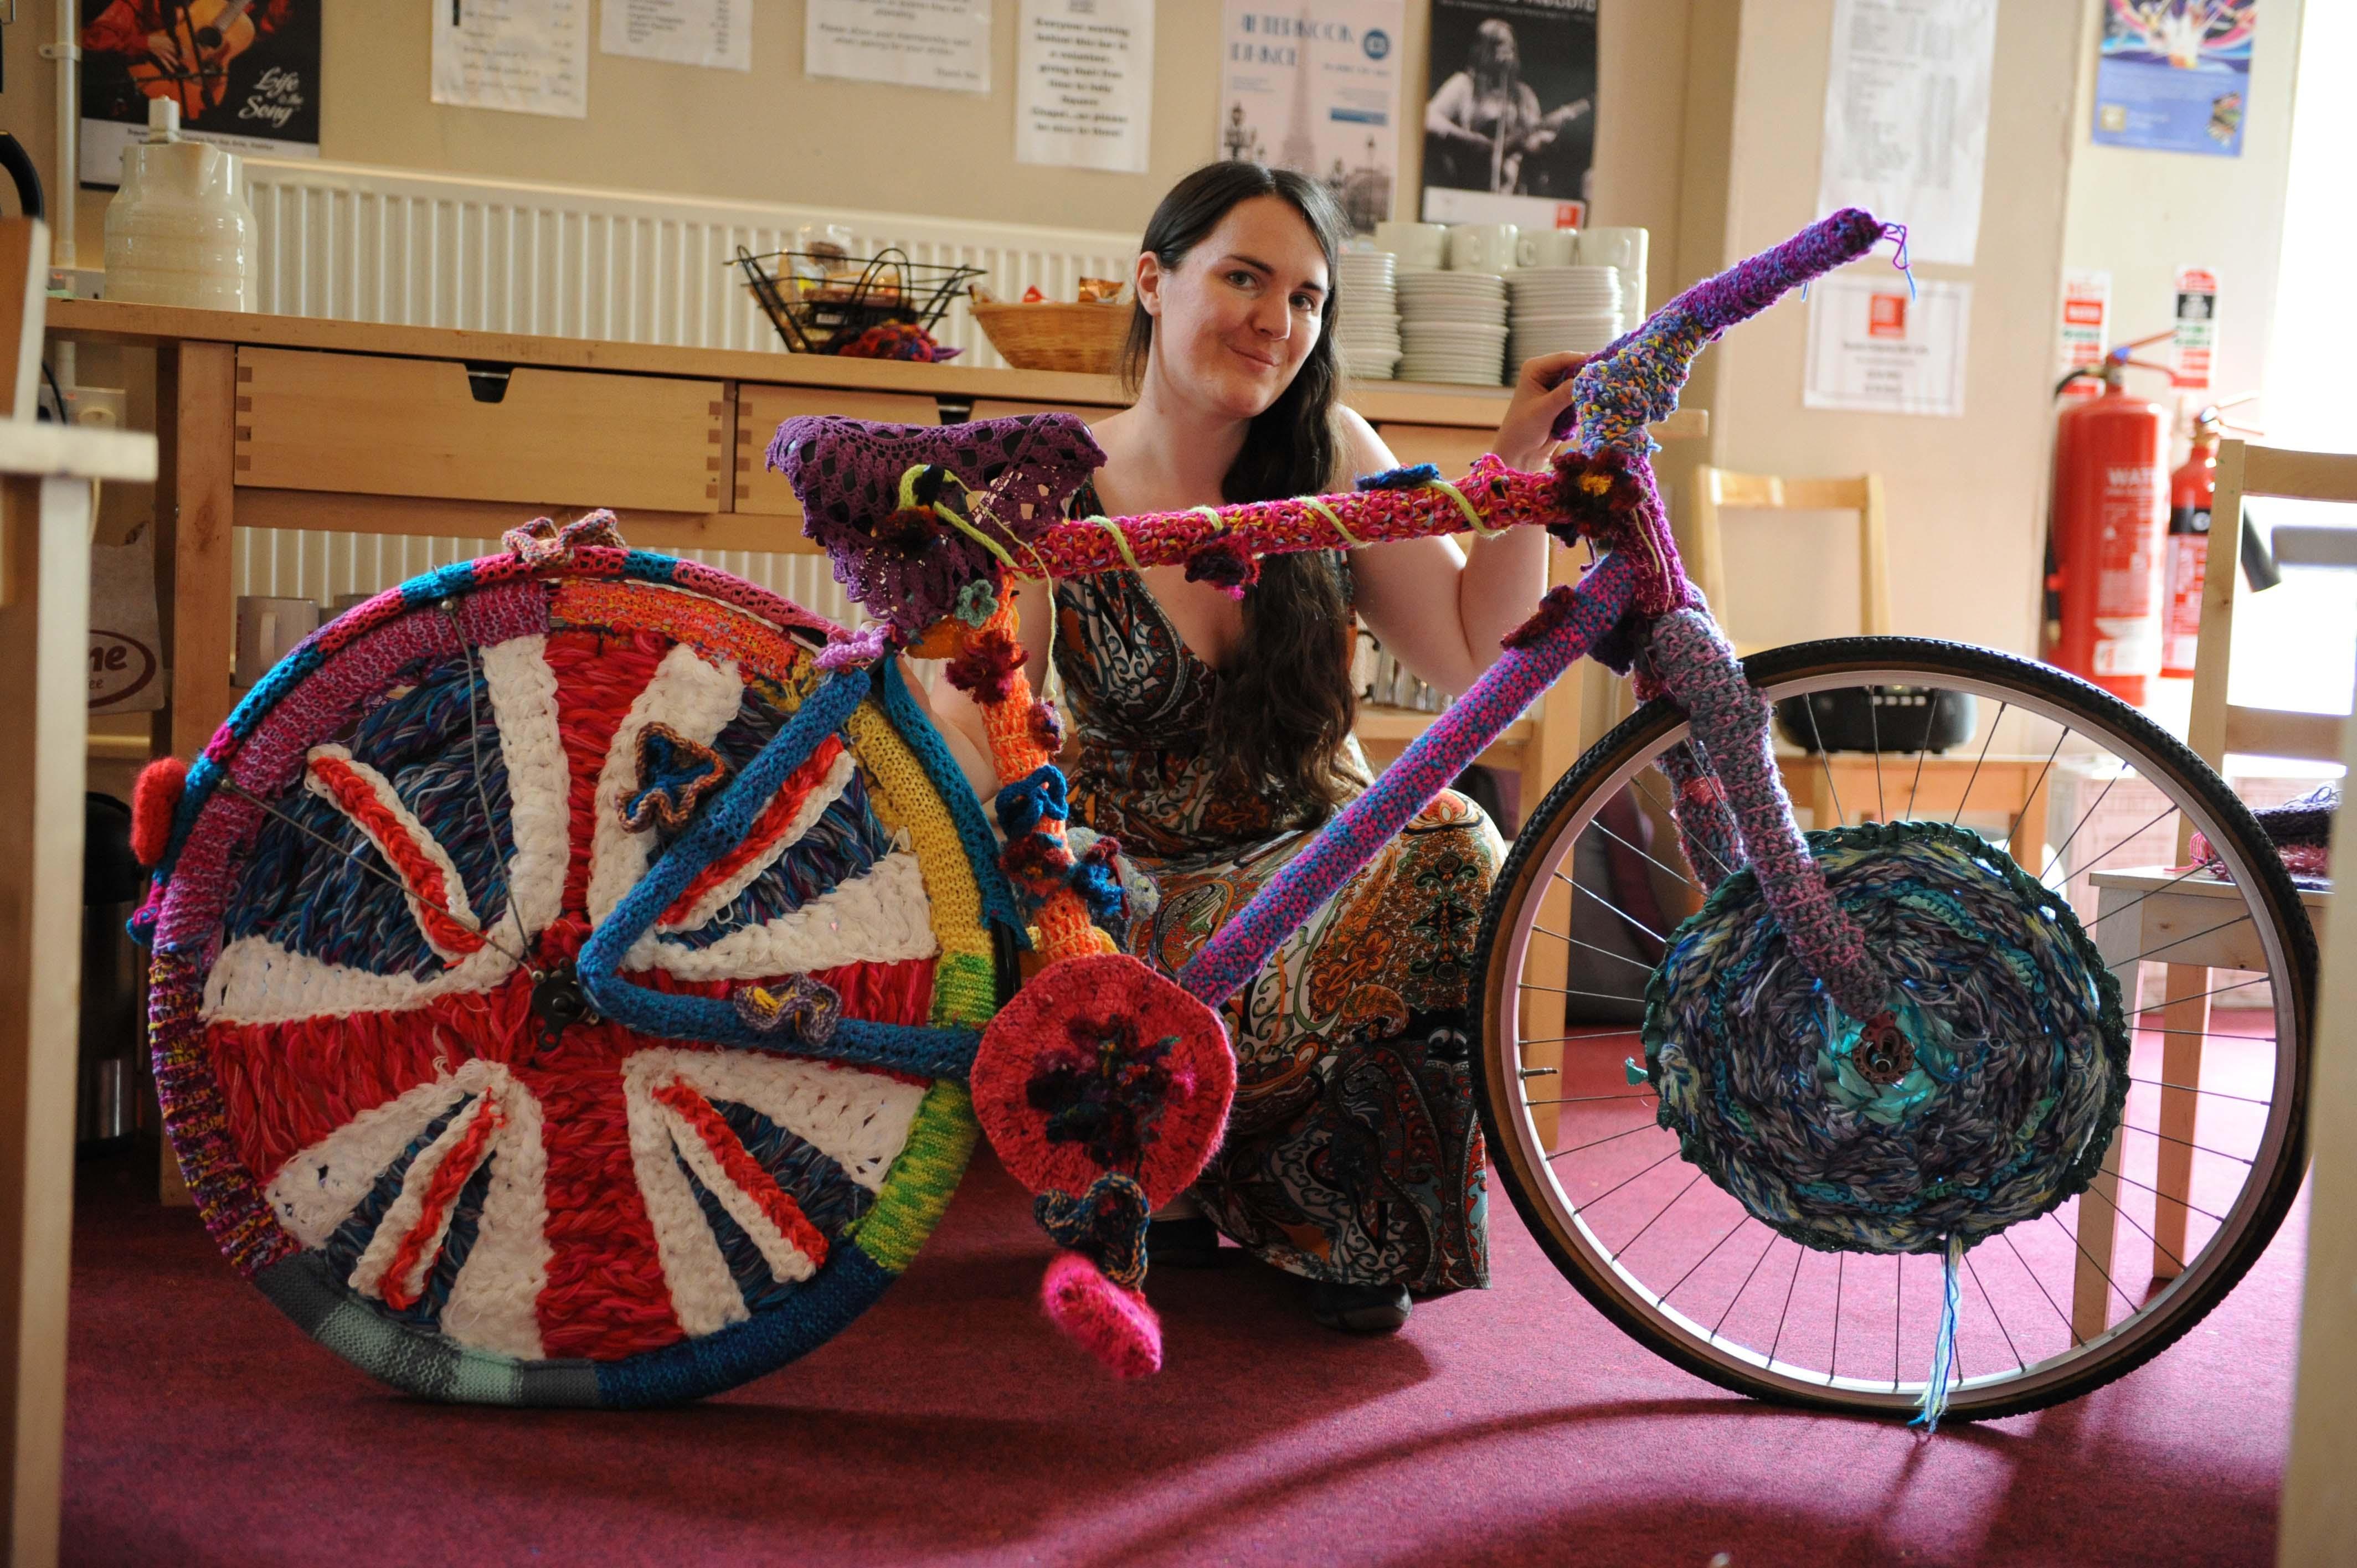 Cassandra and bike